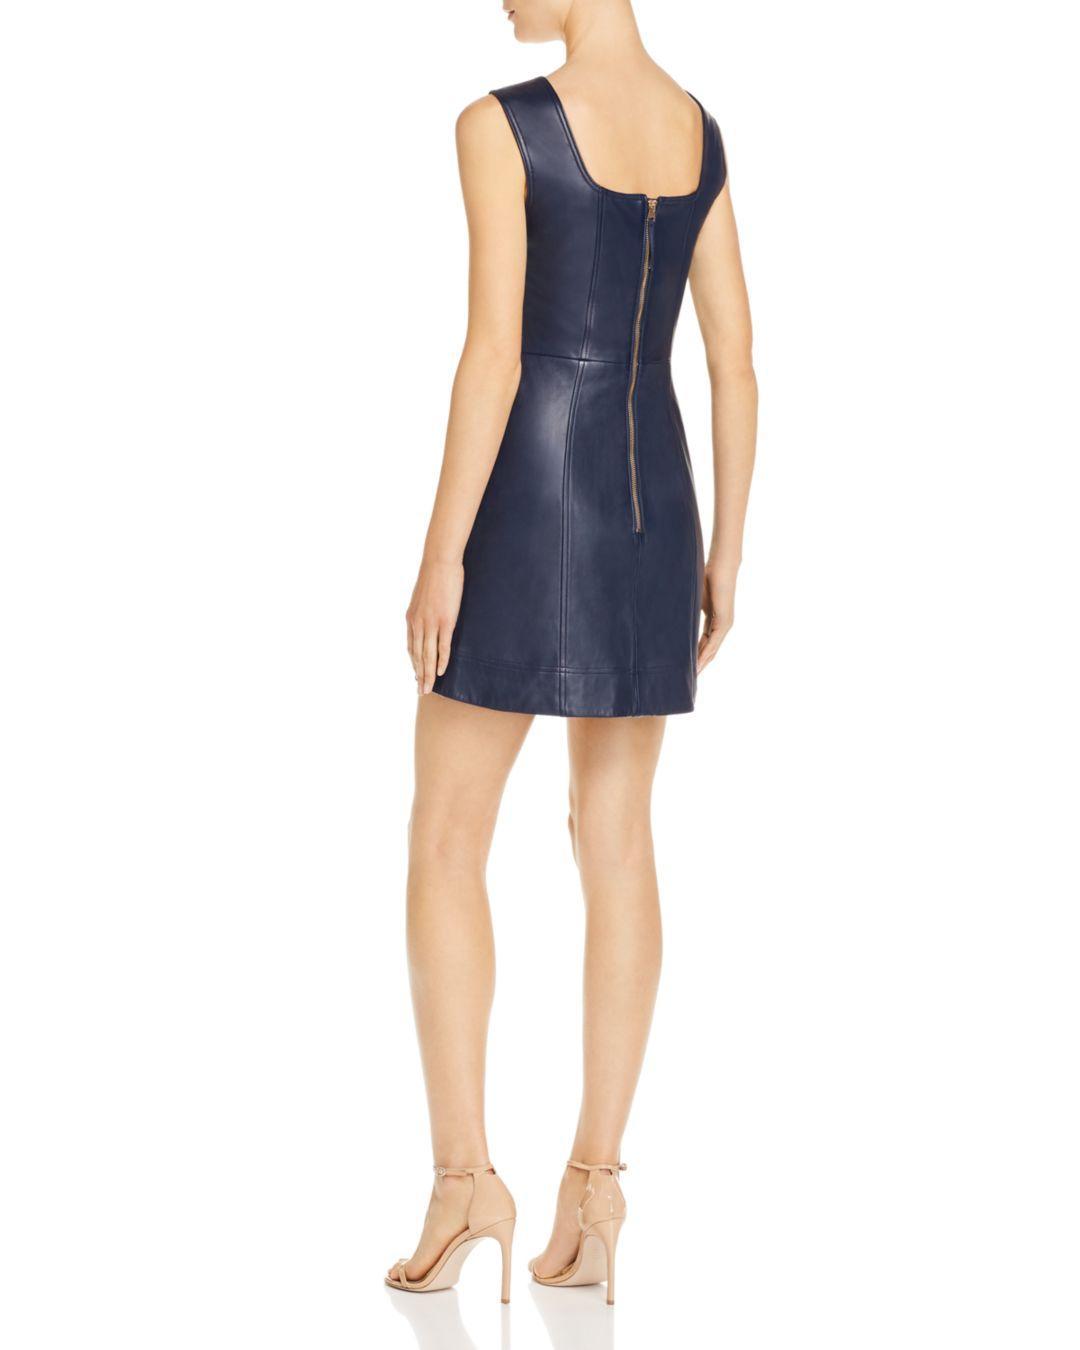 af02b7a68 Alice McCALL Sweet Street Leather Mini Dress in Blue - Lyst